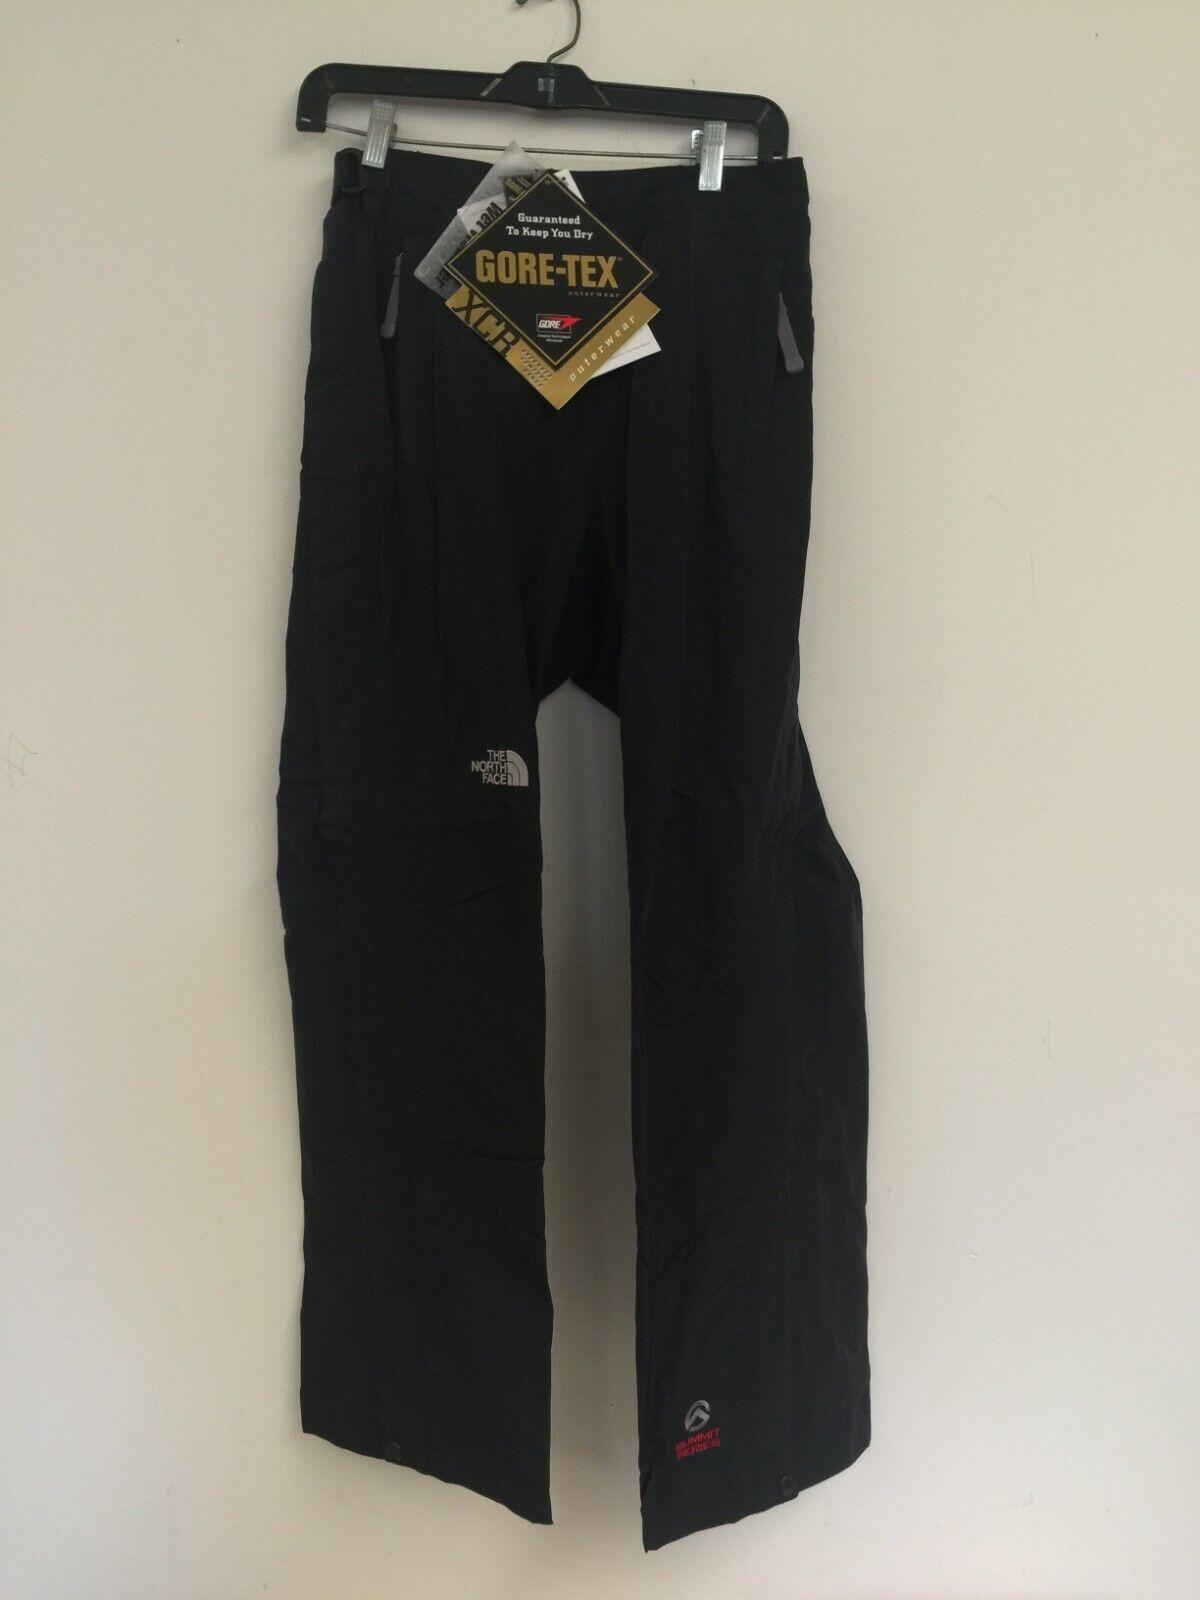 Pantalones ligeros del Norte de face Gore - Tex Mountain talla L zapatos de esquí NWT nuevos